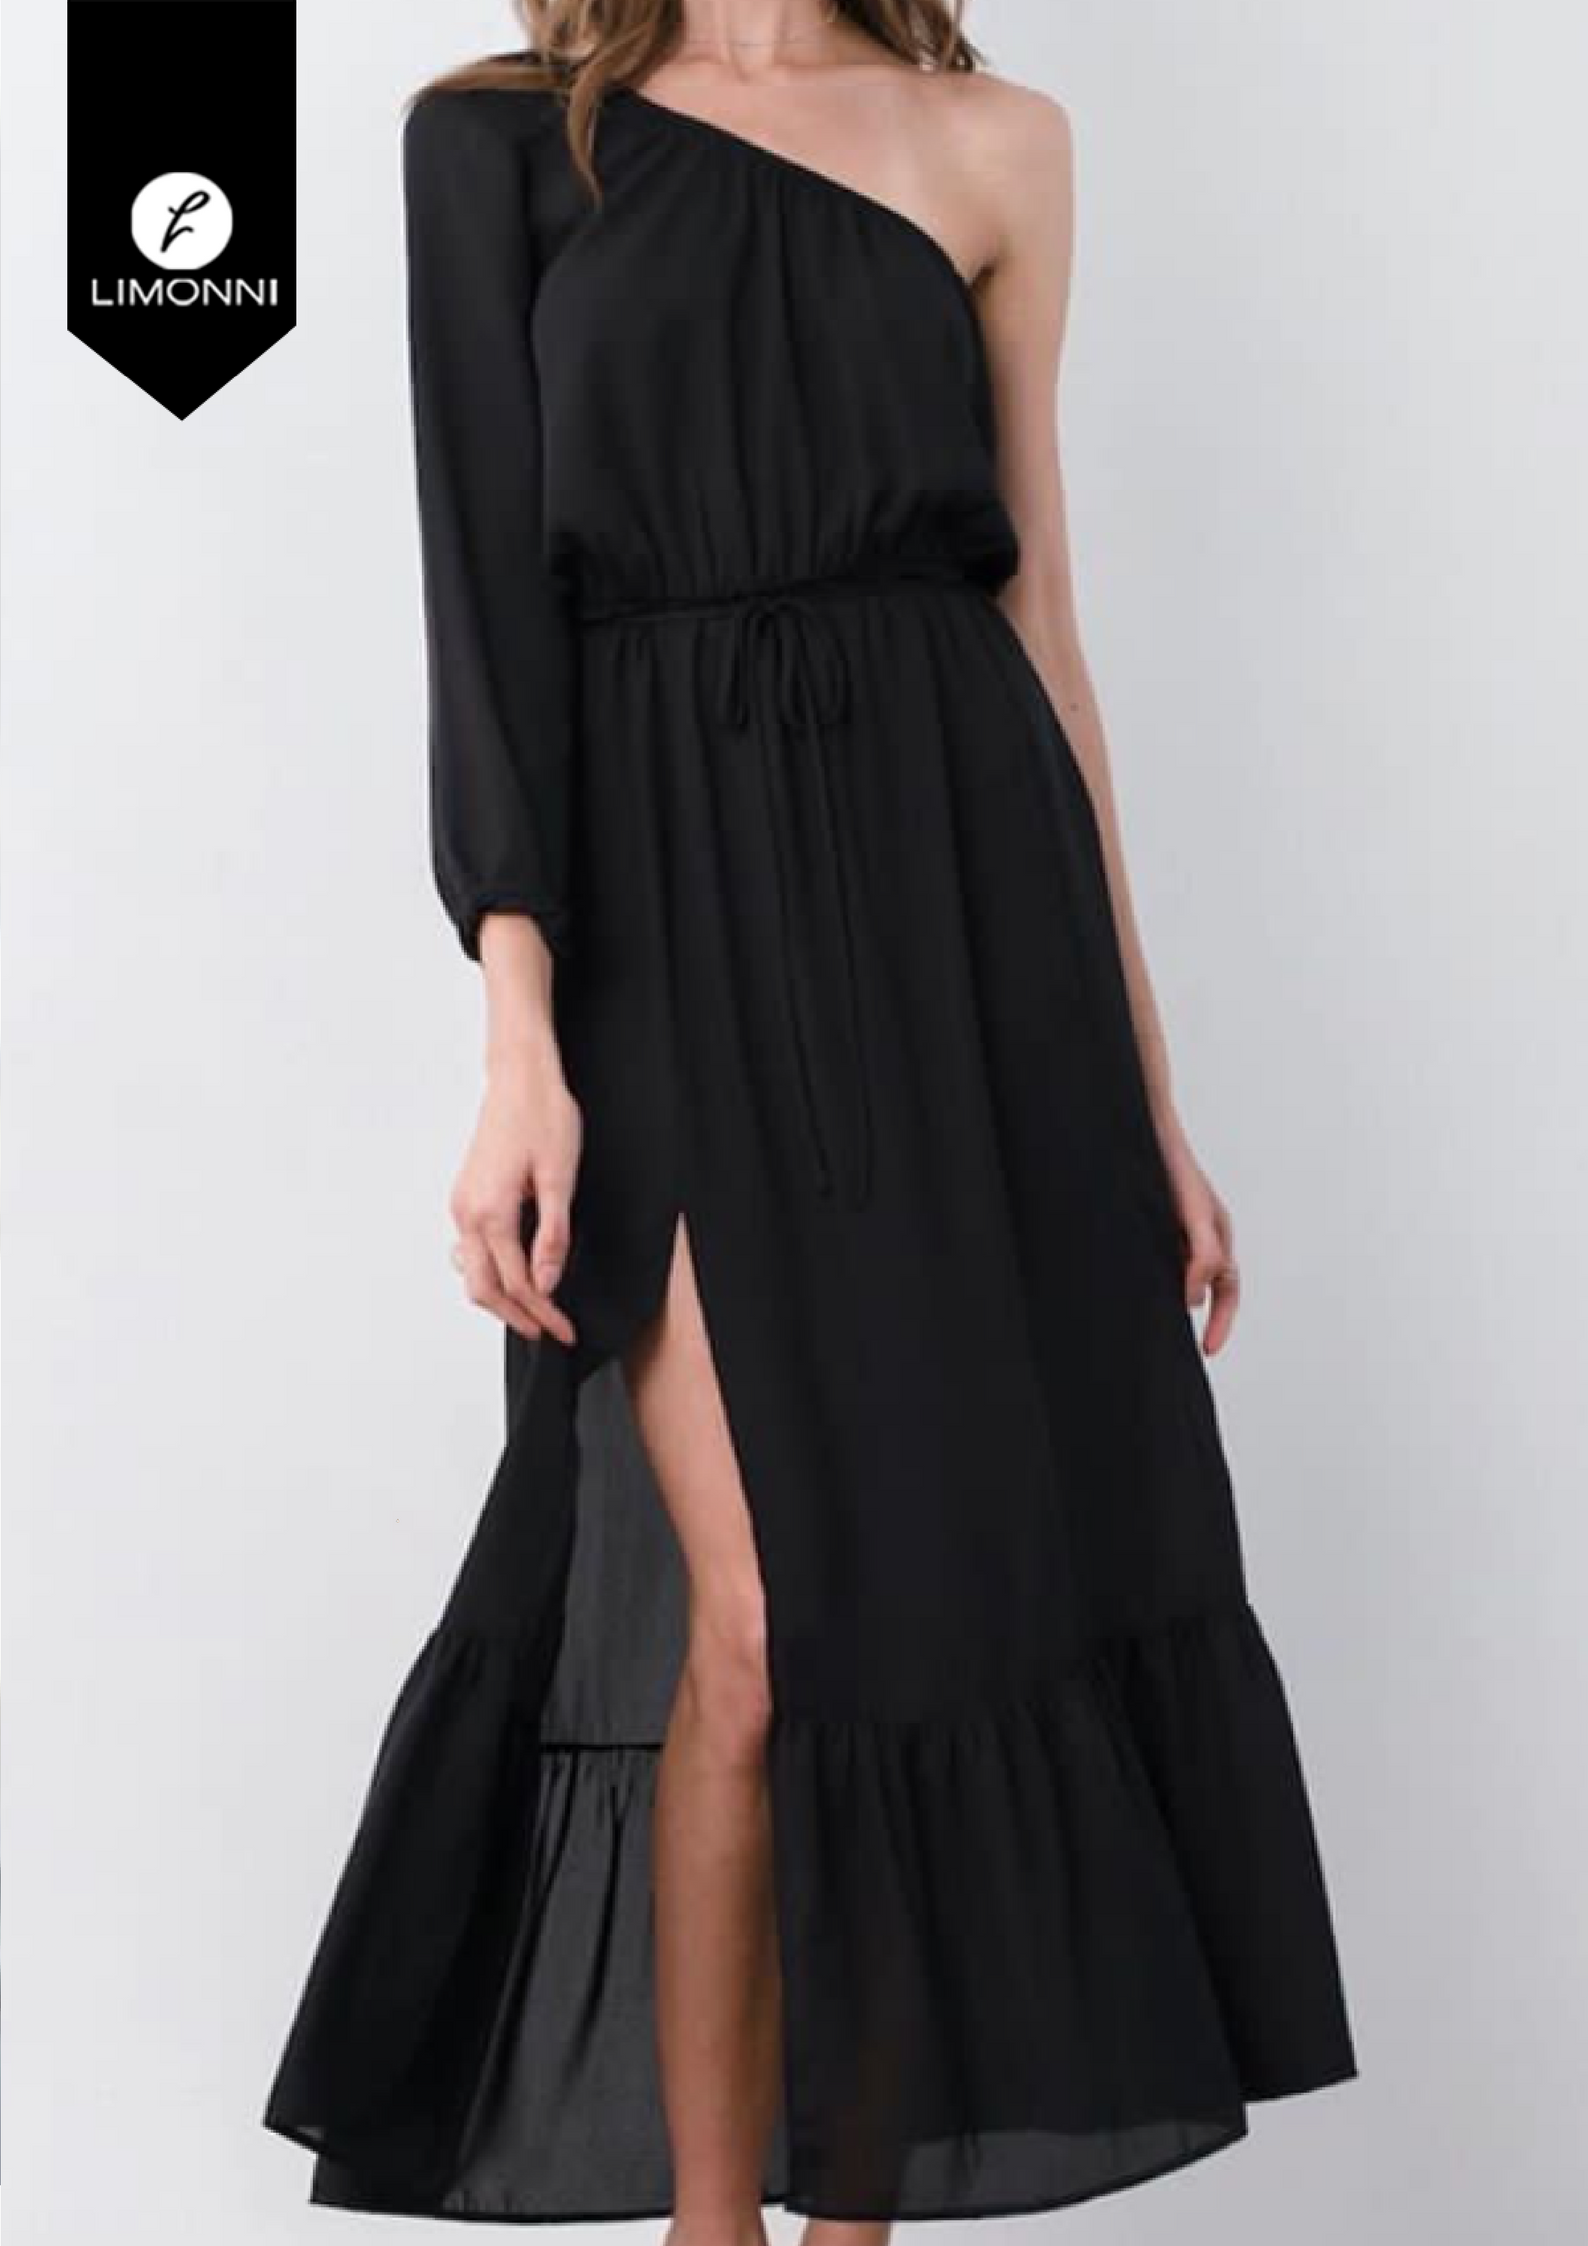 Vestidos para mujer Limonni Bennett LI1353 Largos elegantes